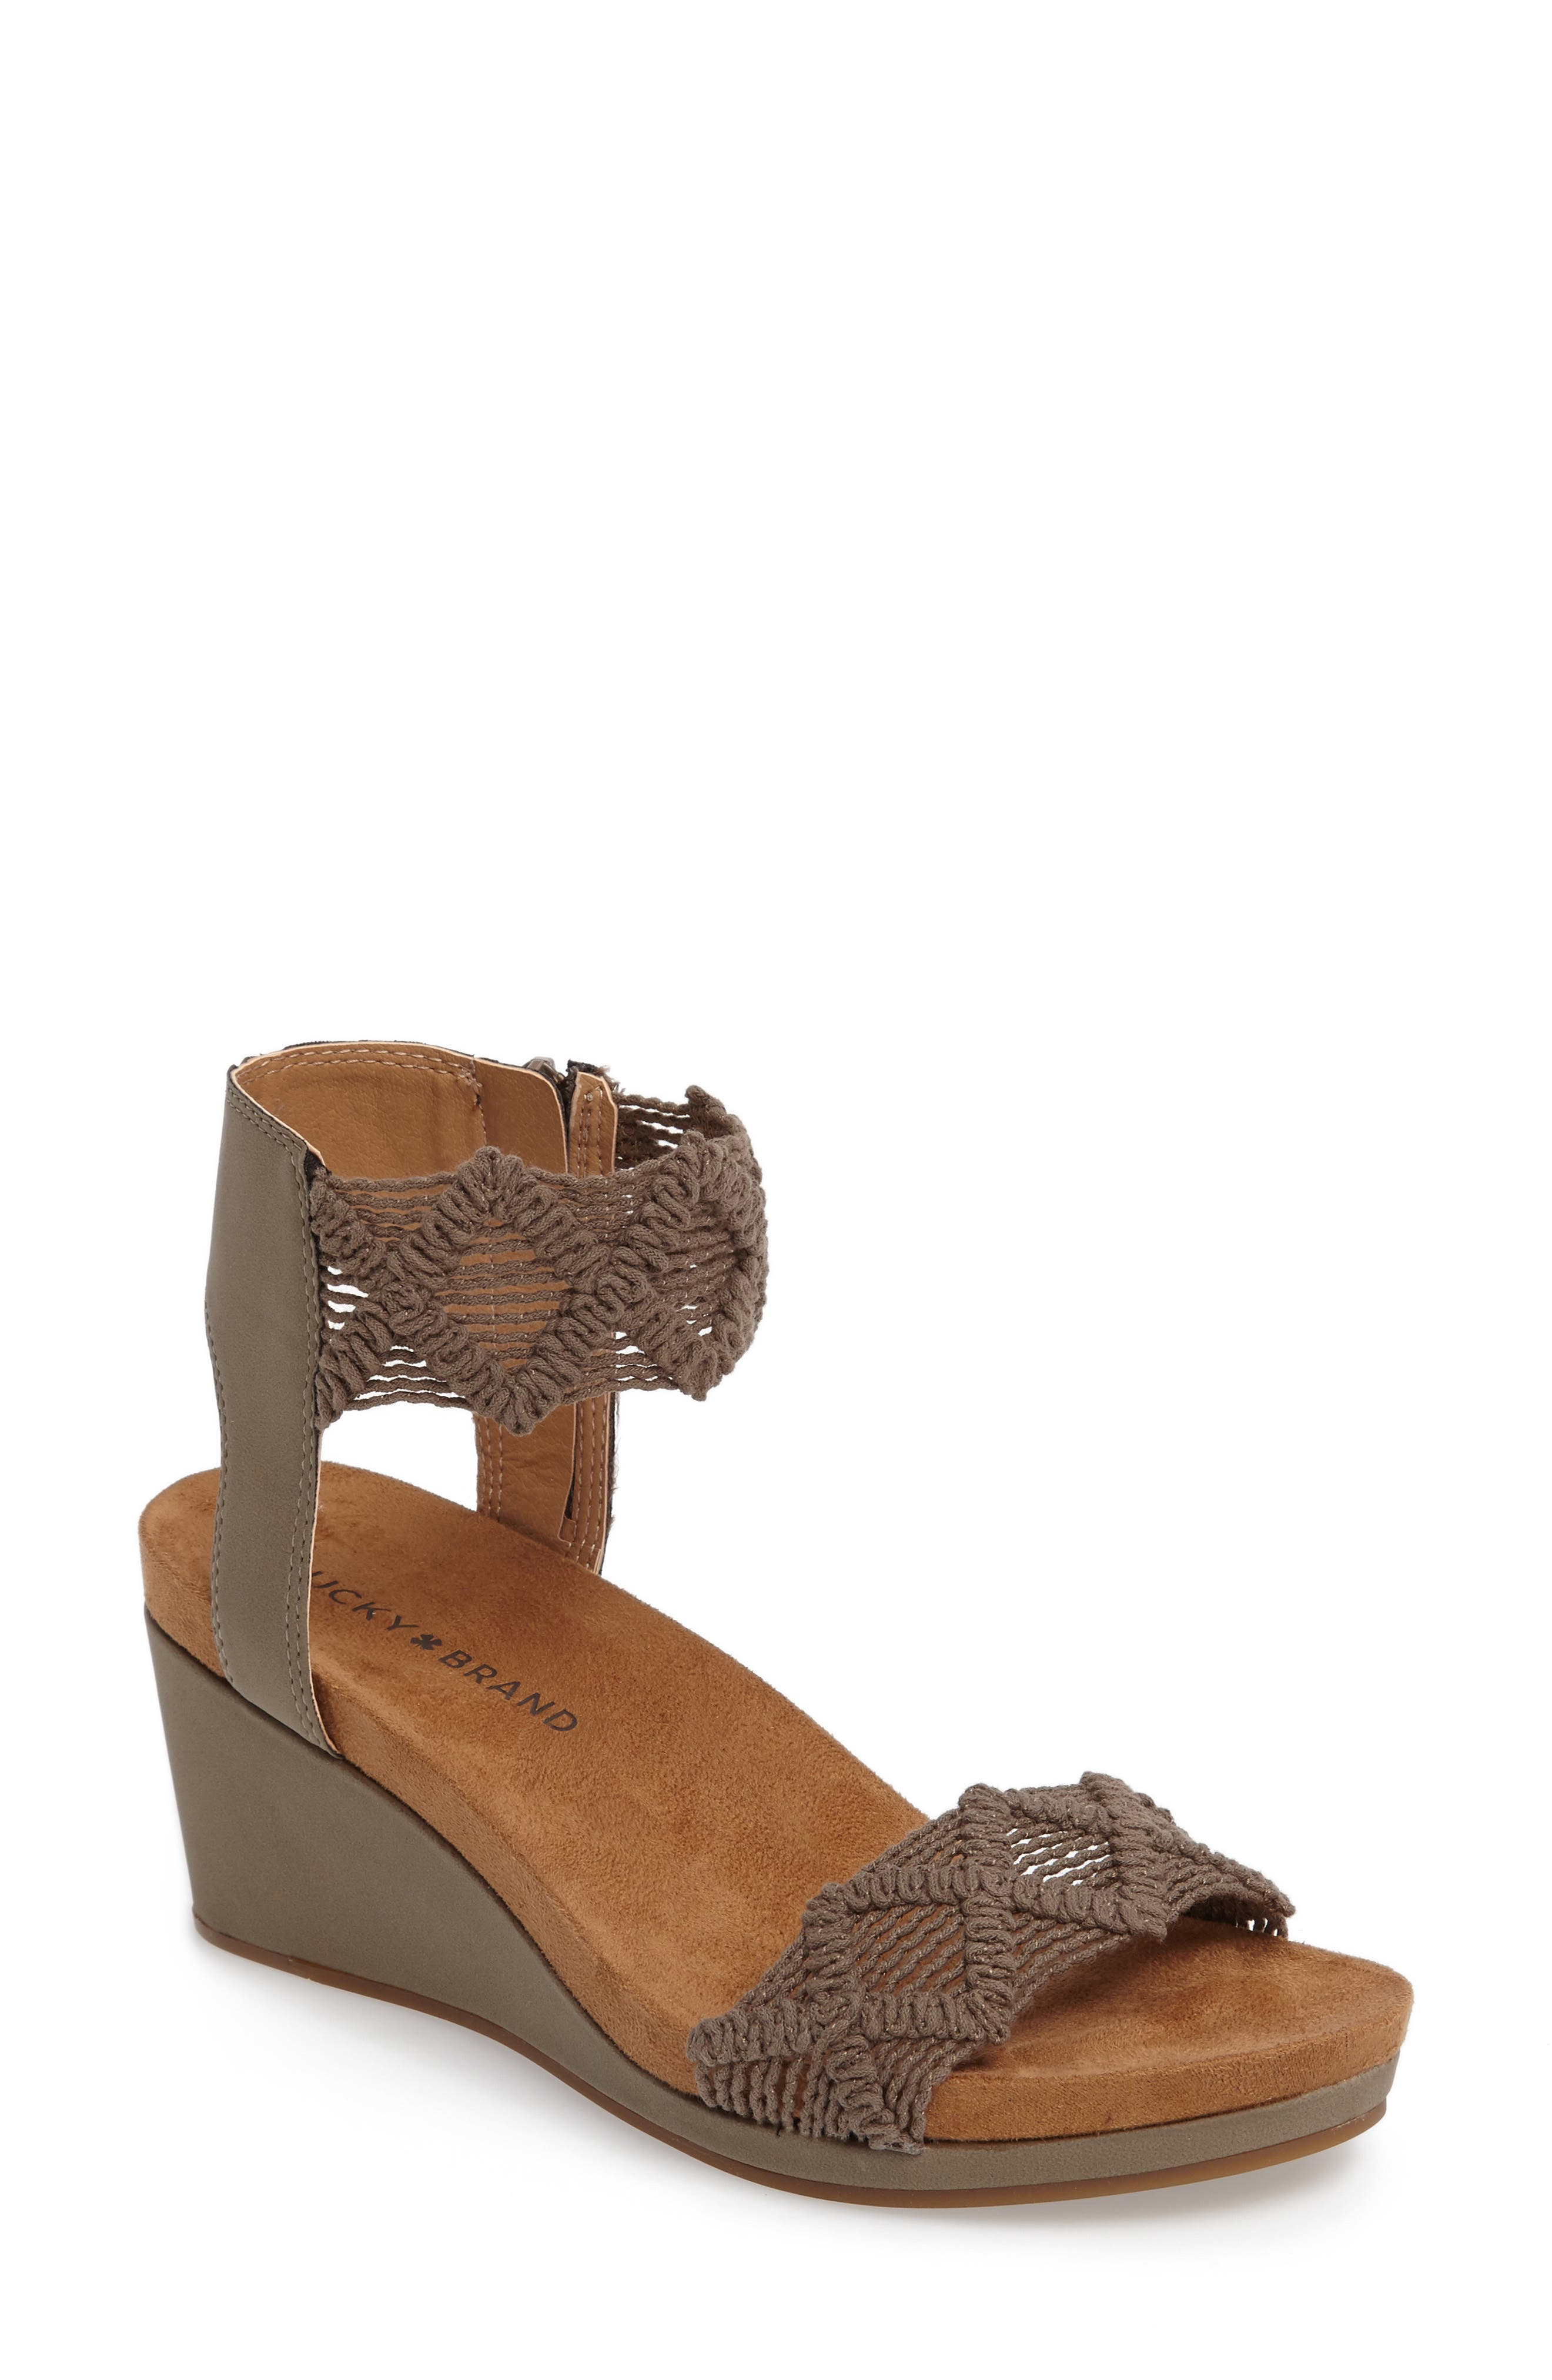 Main Image - Lucky Brand Kierlo Wedge Sandal (Women)